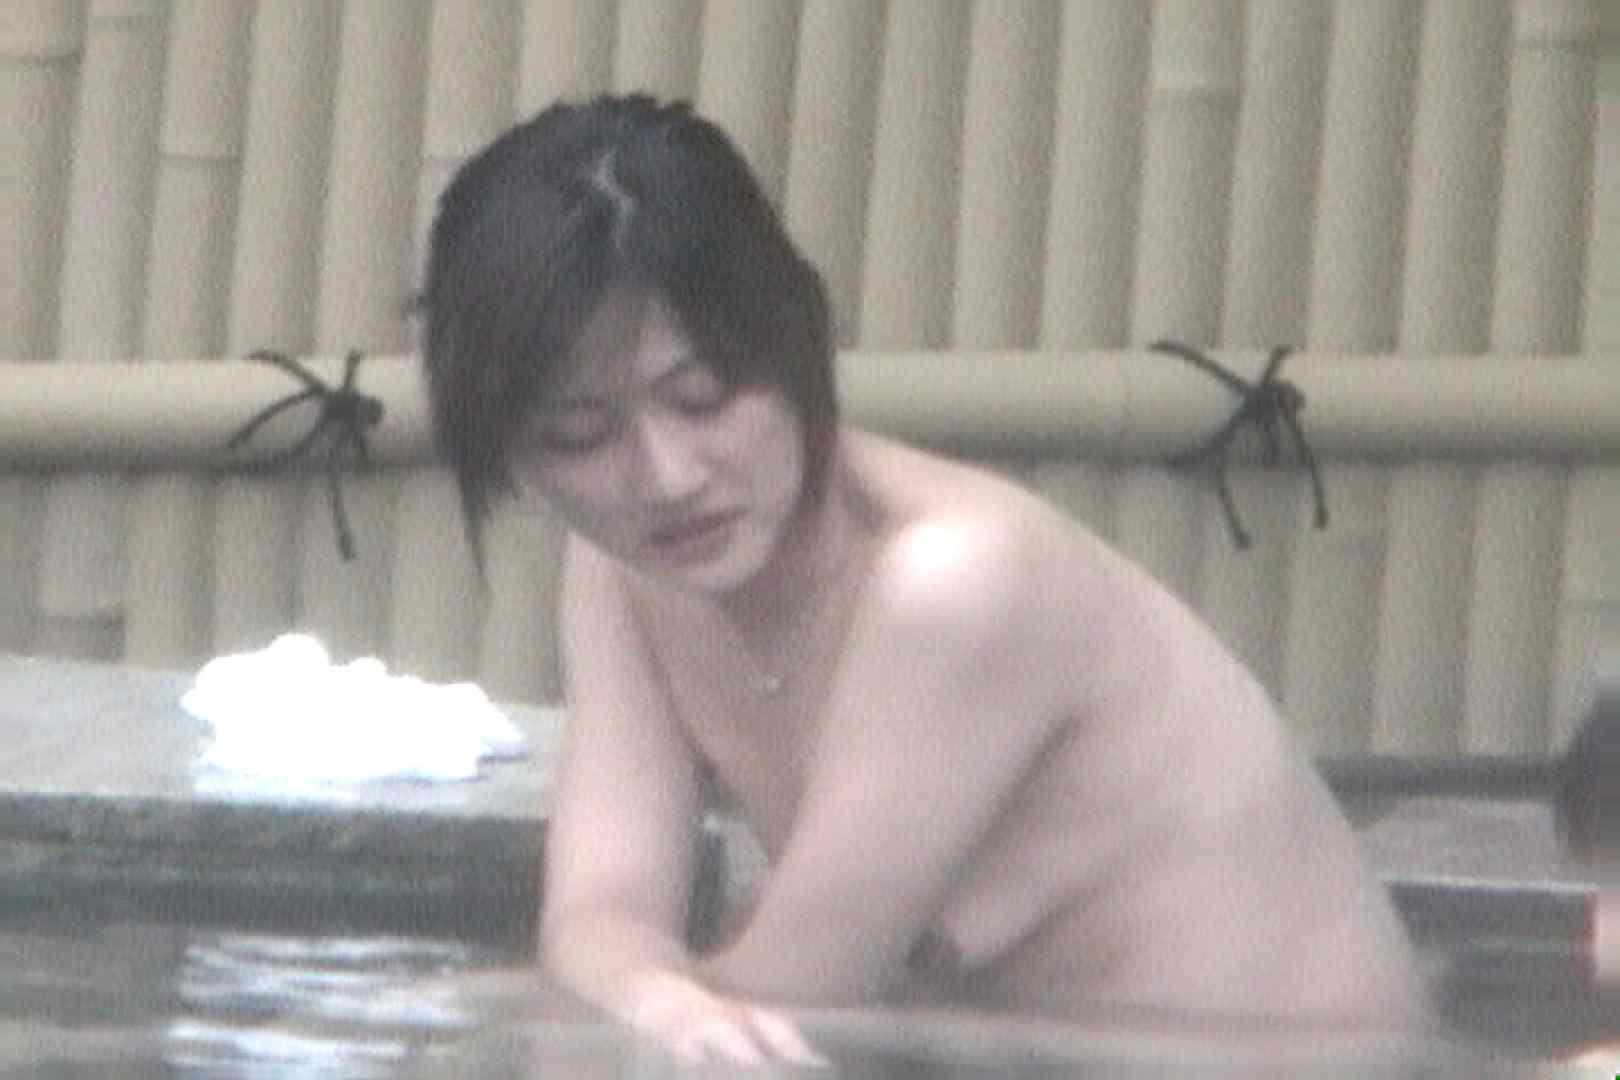 Aquaな露天風呂Vol.553 0   0  106連発 15